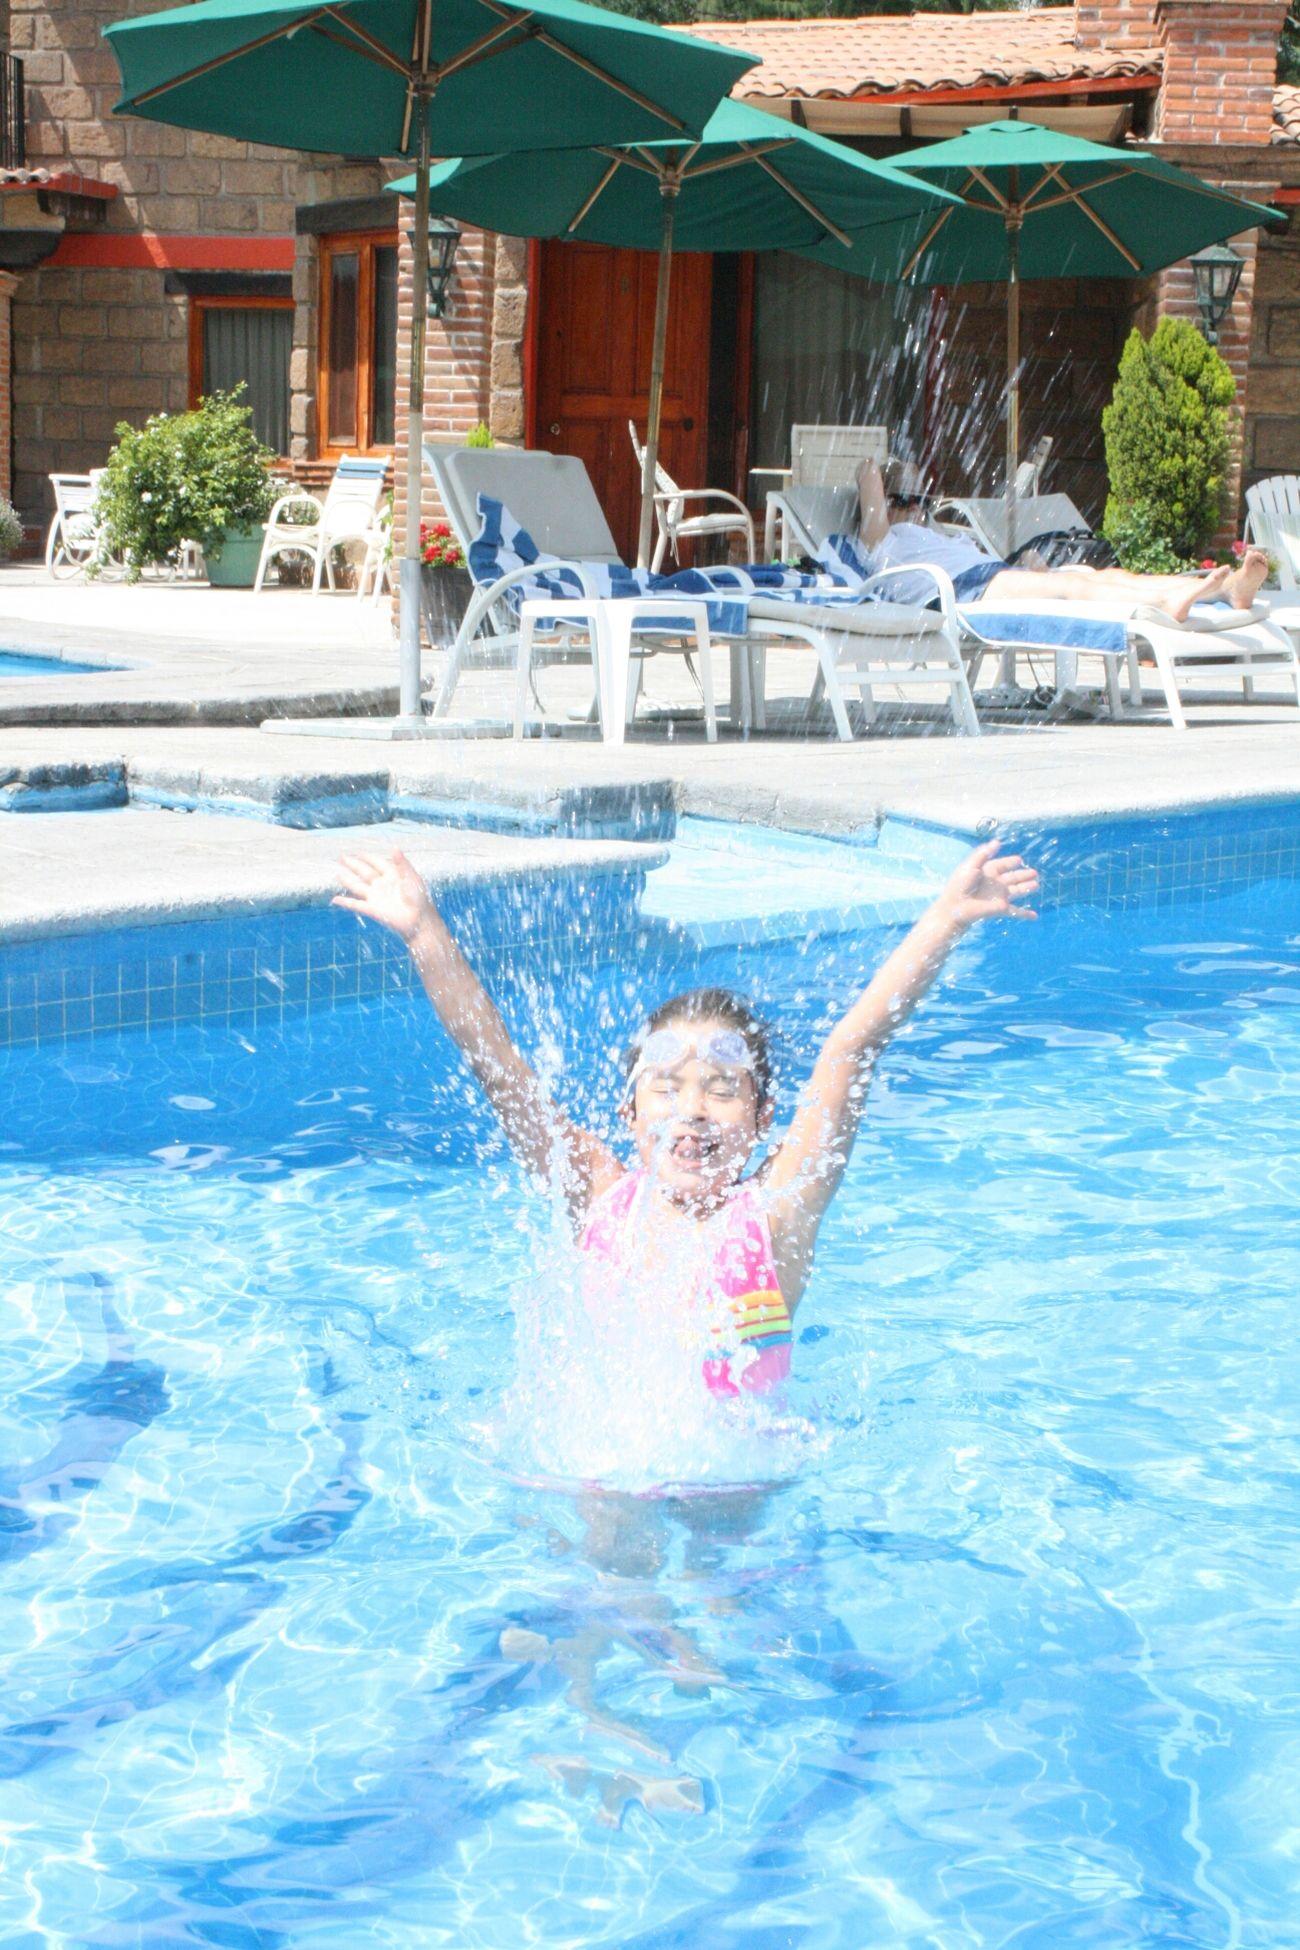 Wonhglück Playing With Water Fun!!